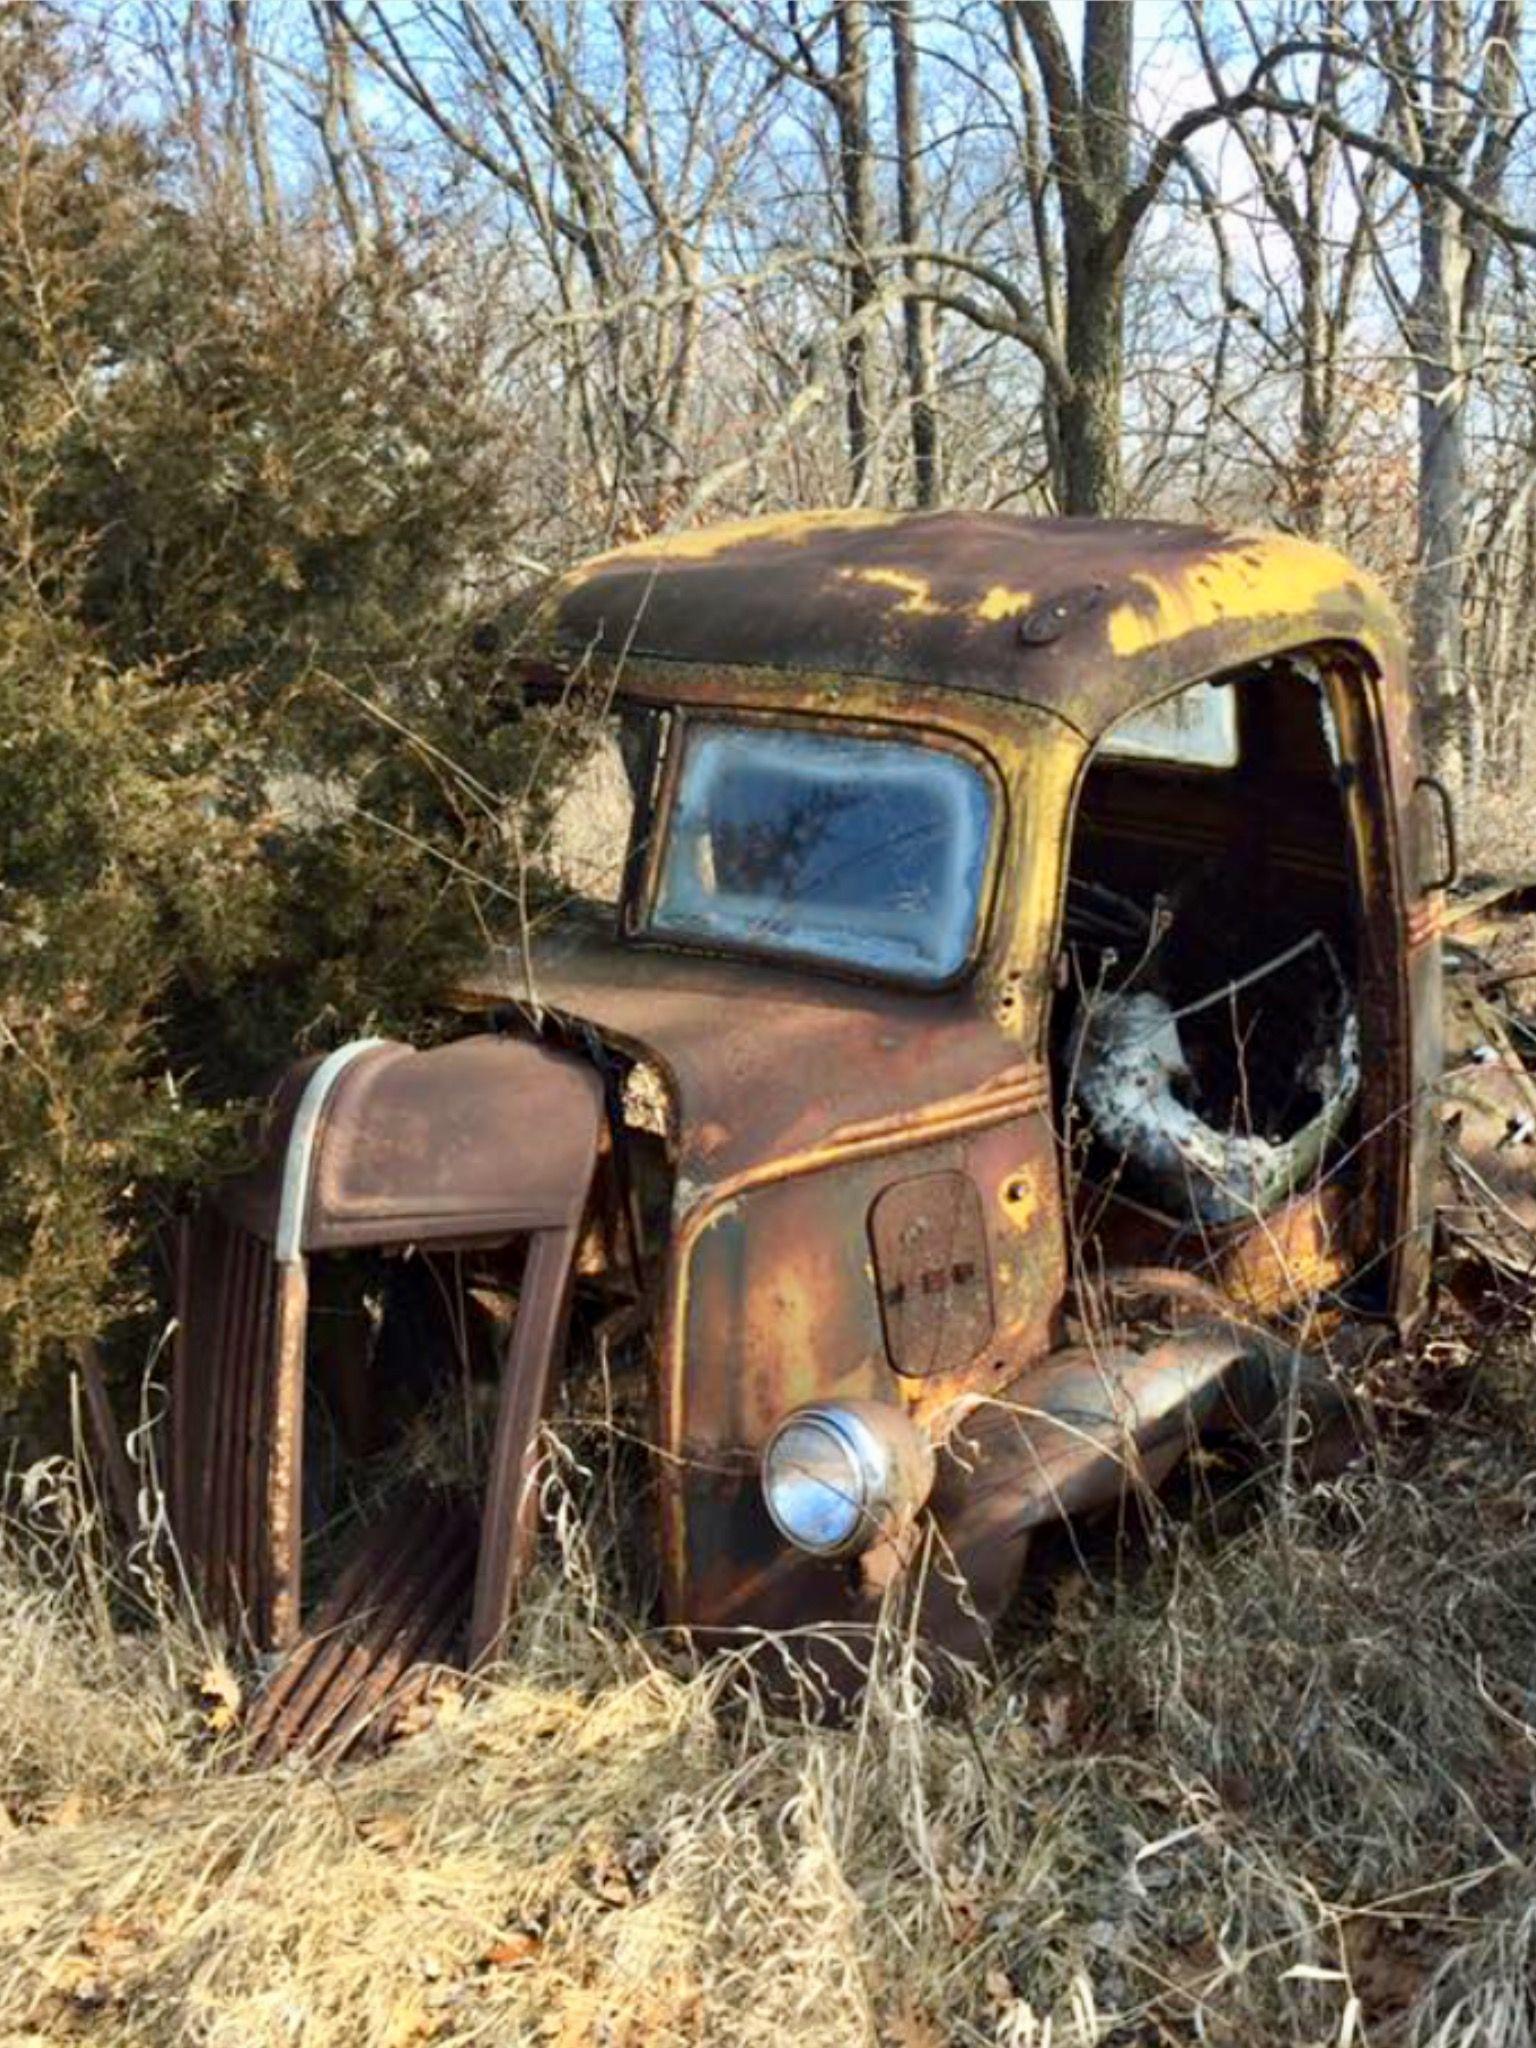 Old abandoned car in the cargraveyard. Source Facebook.com ...